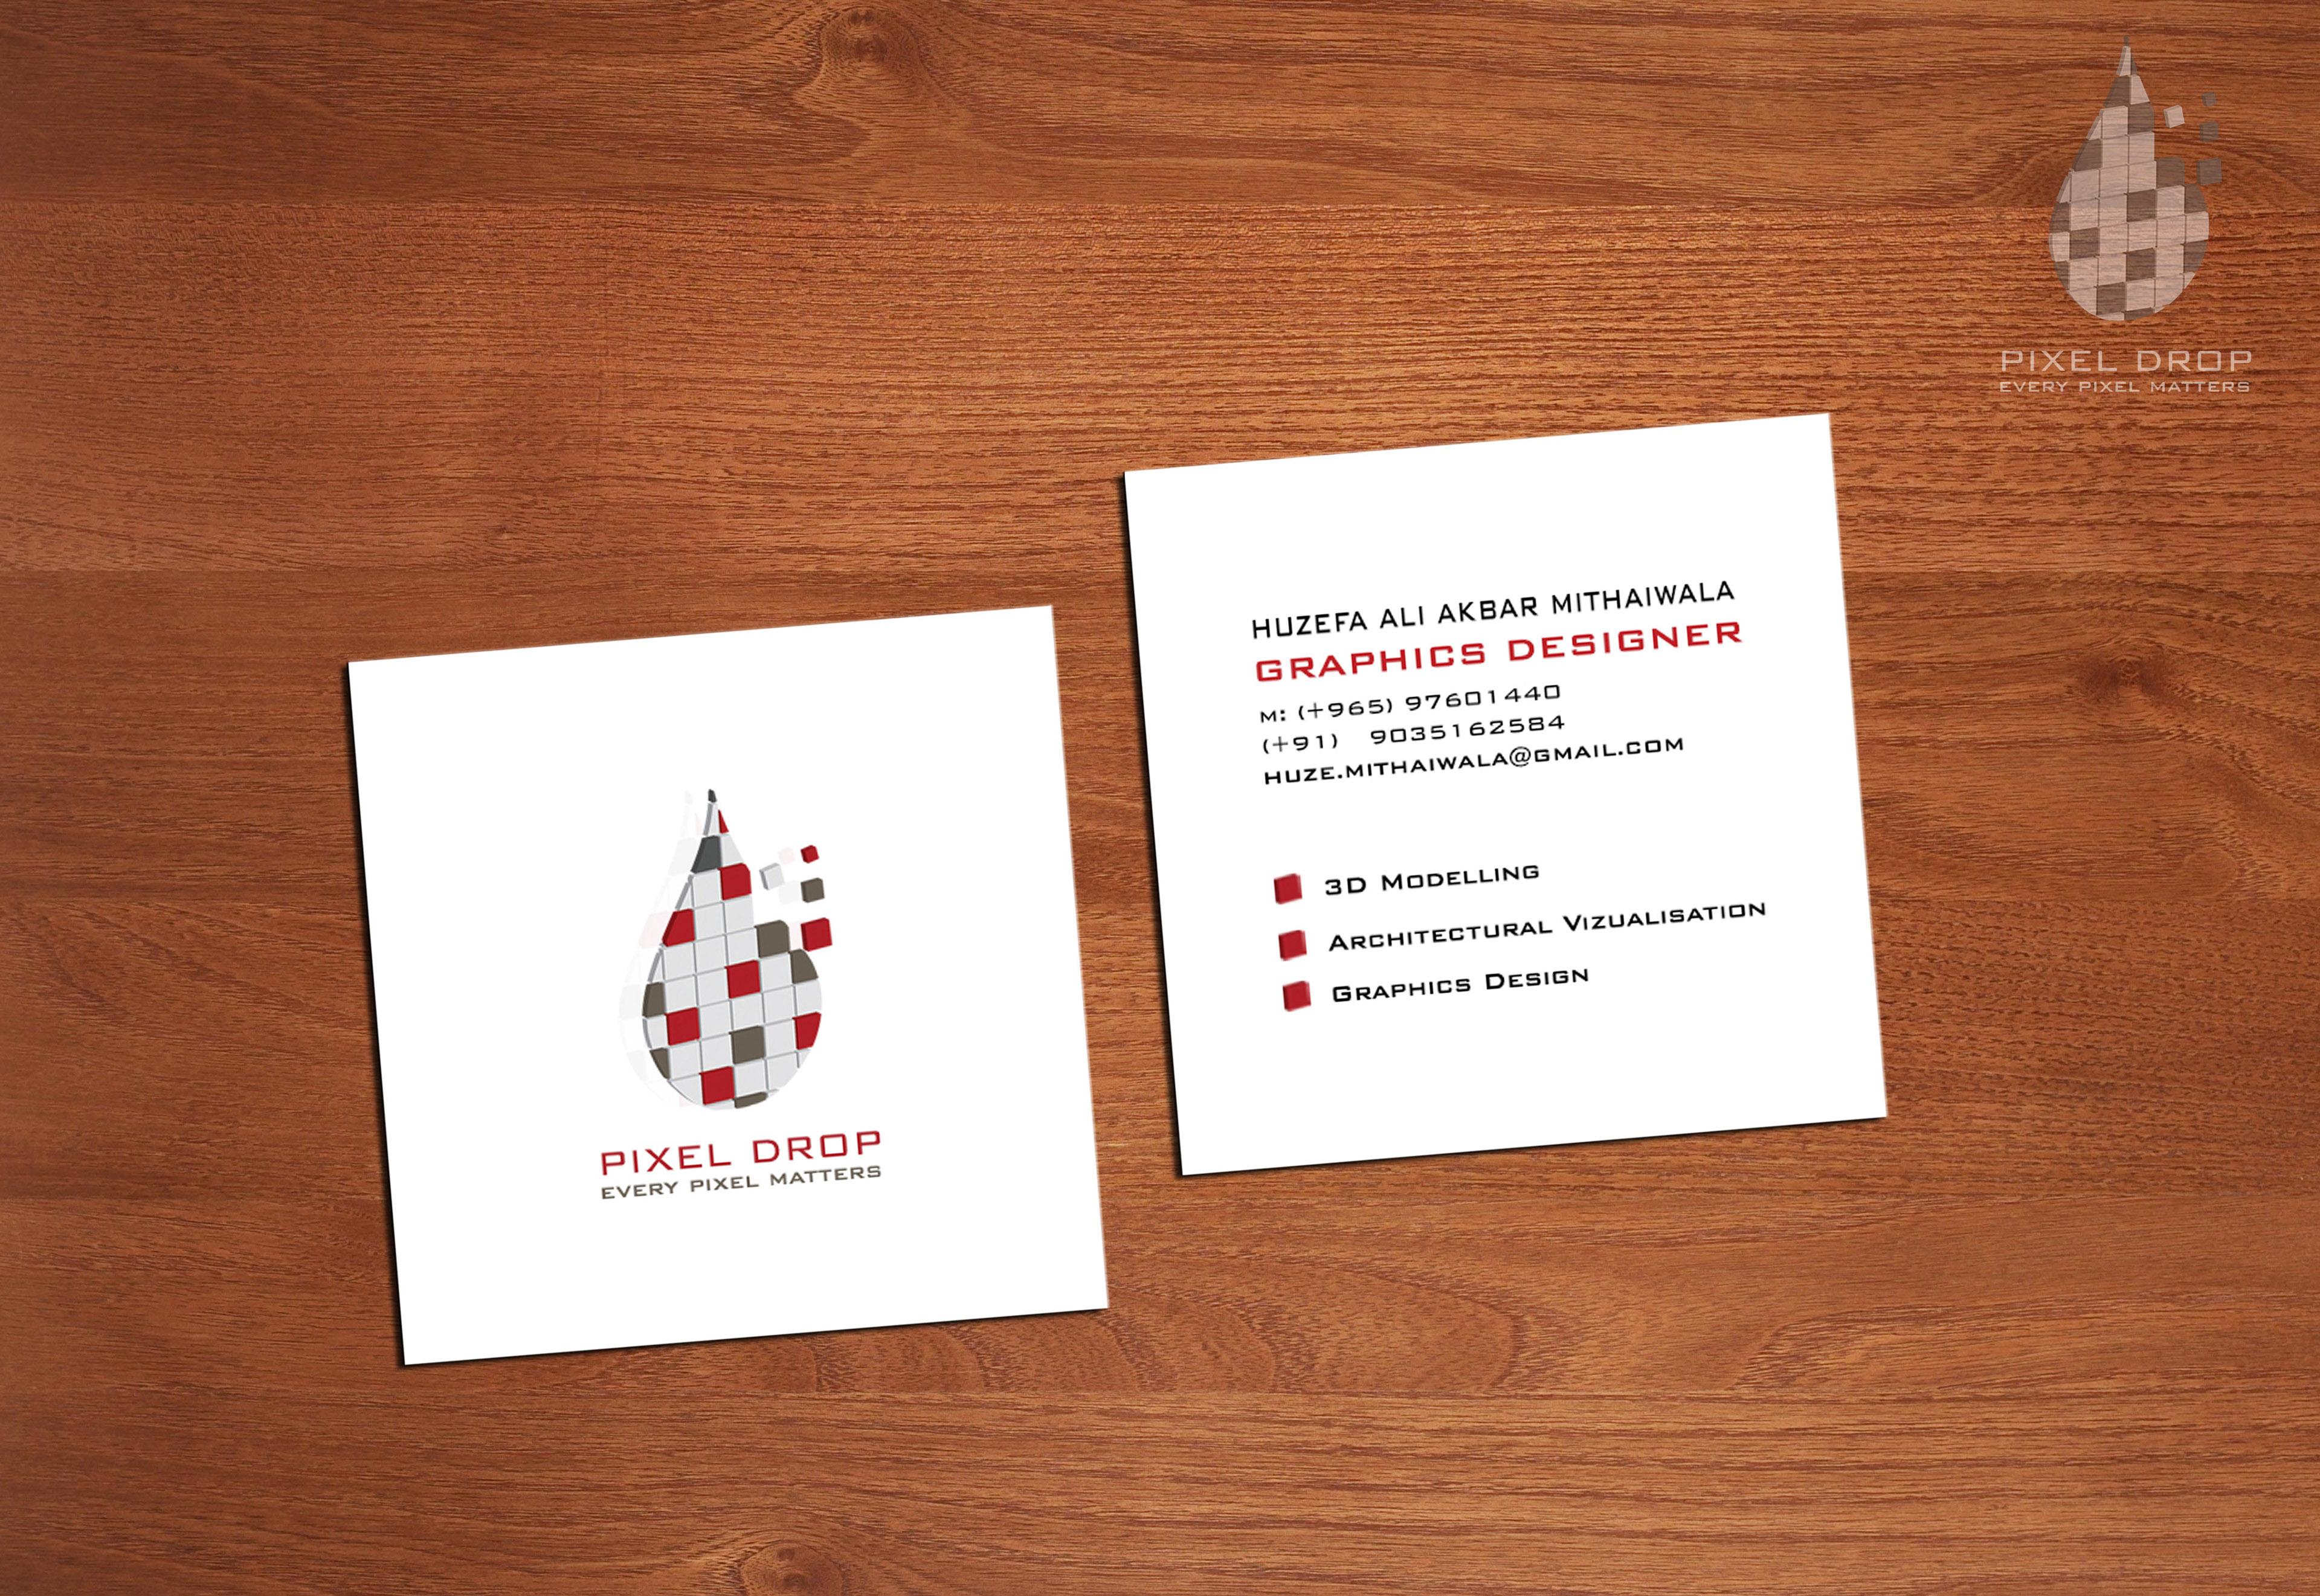 pixel drop kuwait pixel drop studio business card